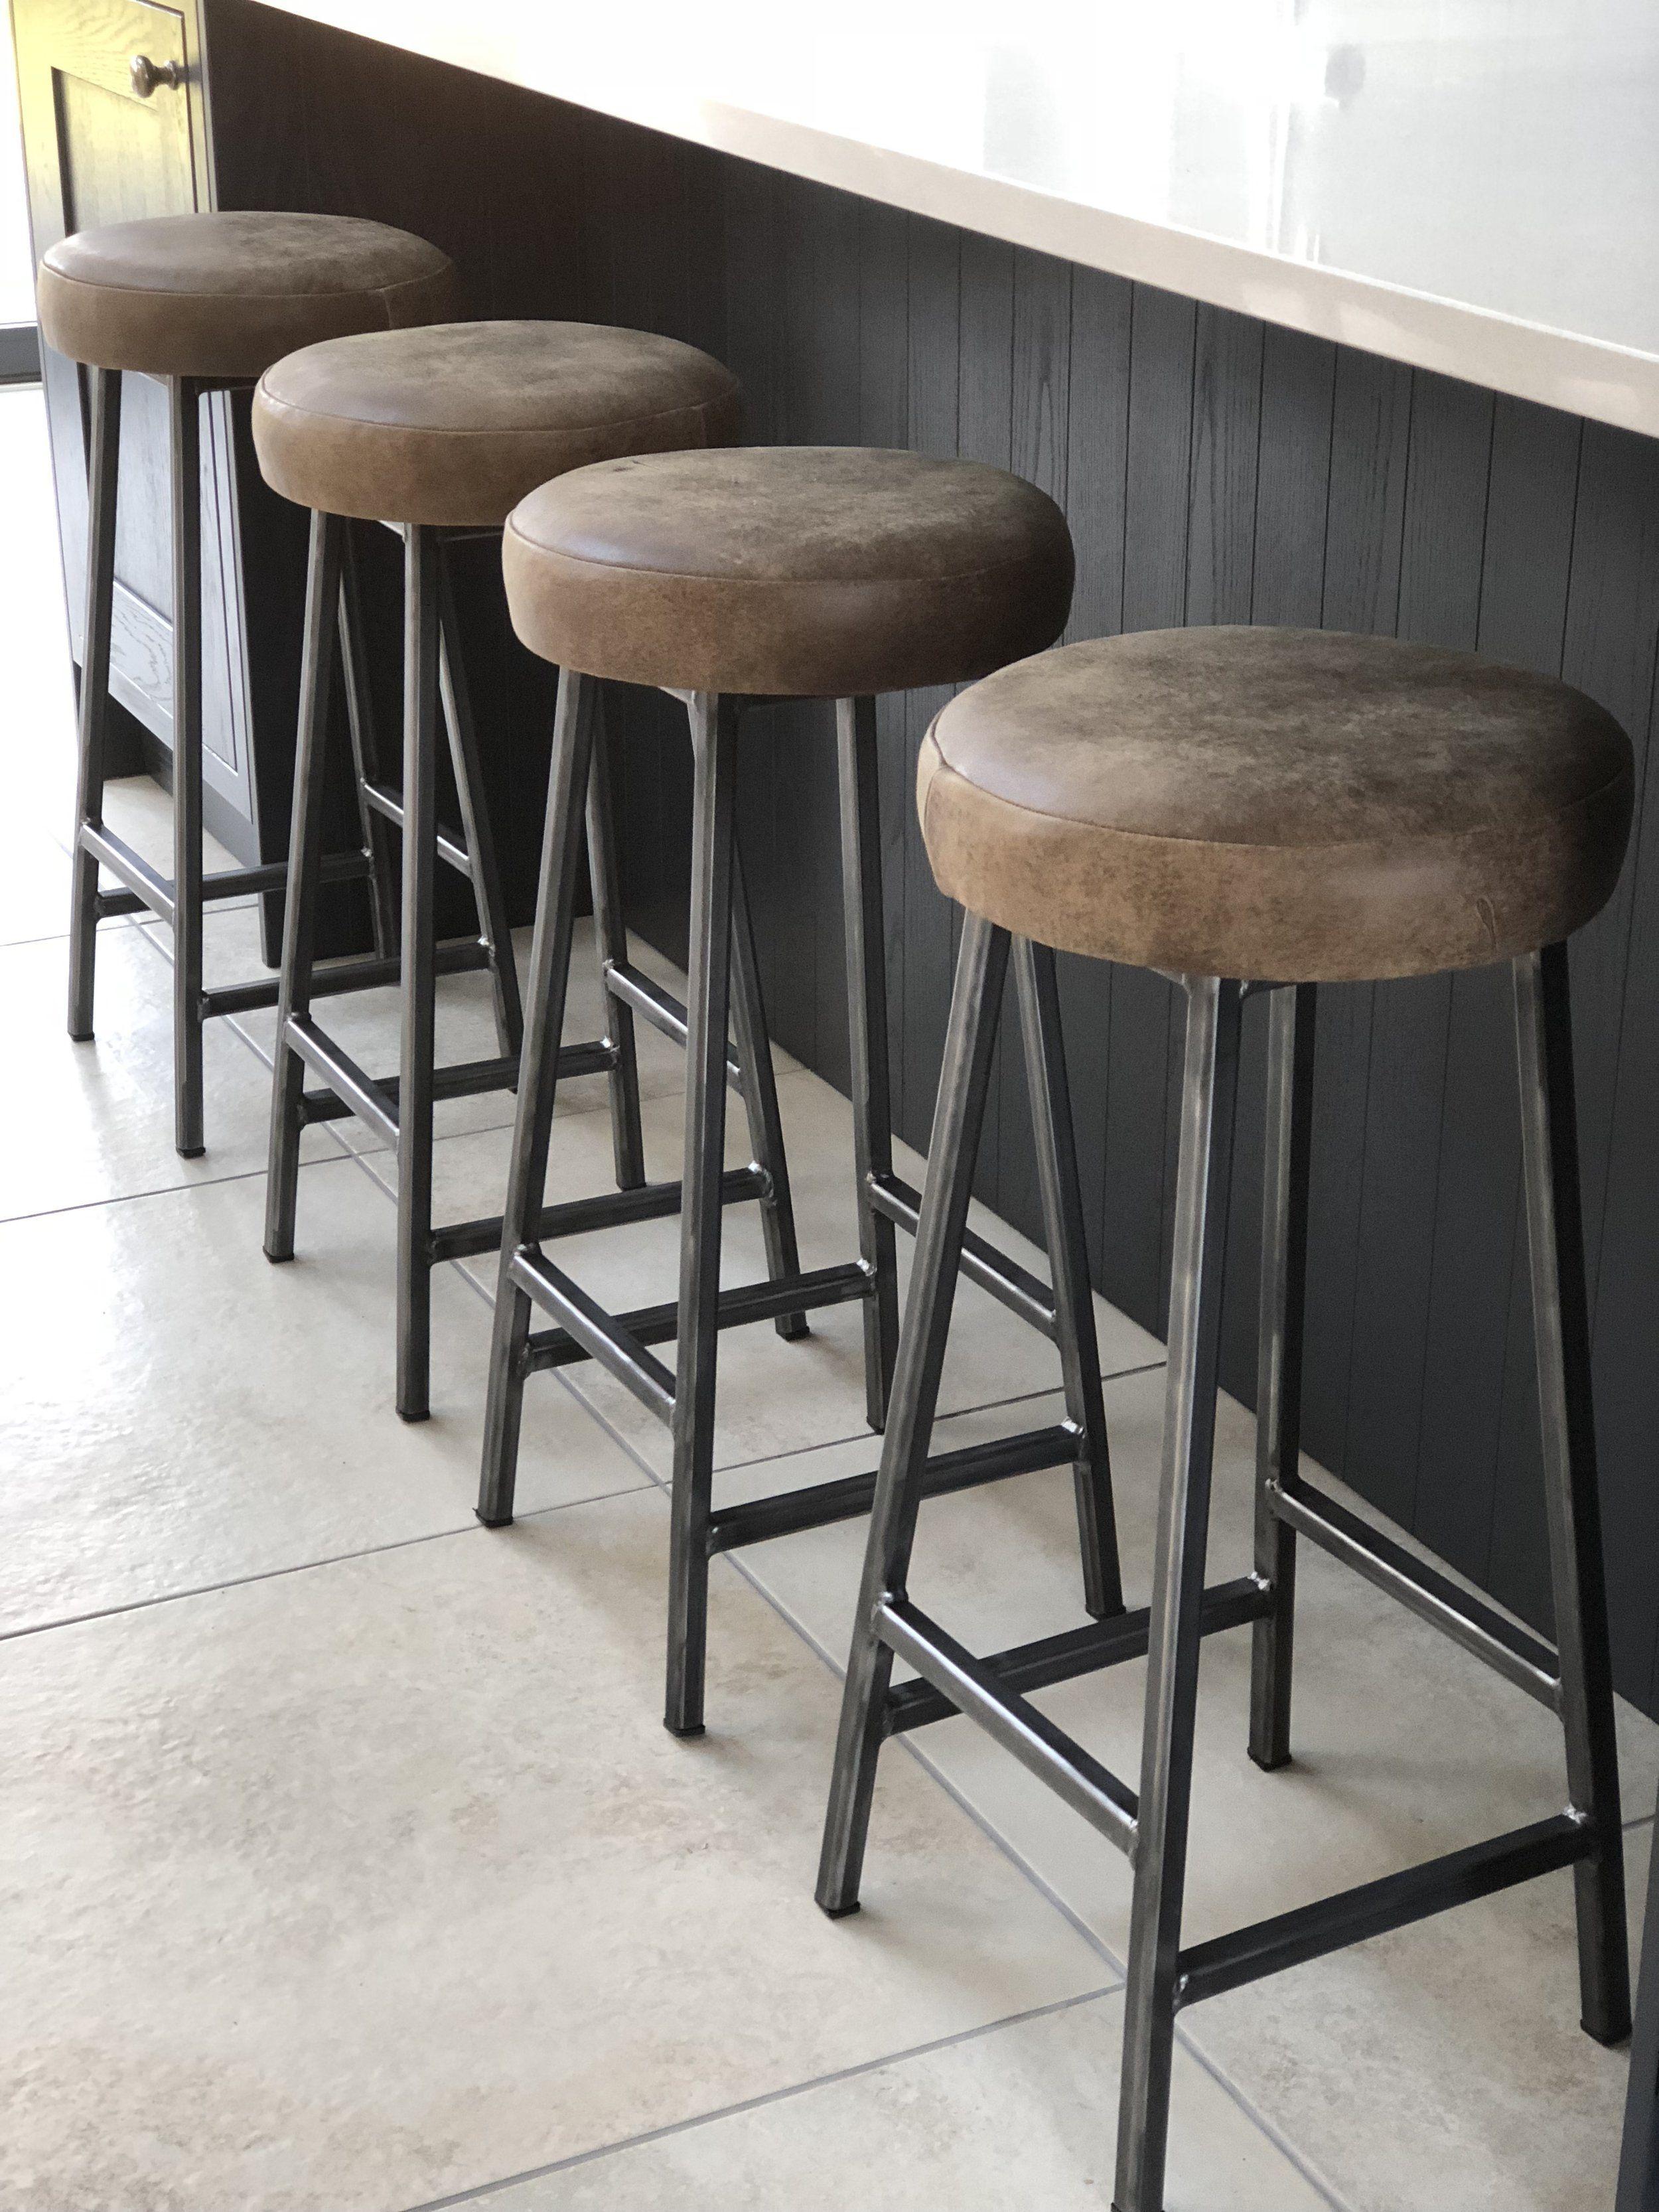 Industrial Bar Stools Paul Frampton Design Ltd In 2020 Padded